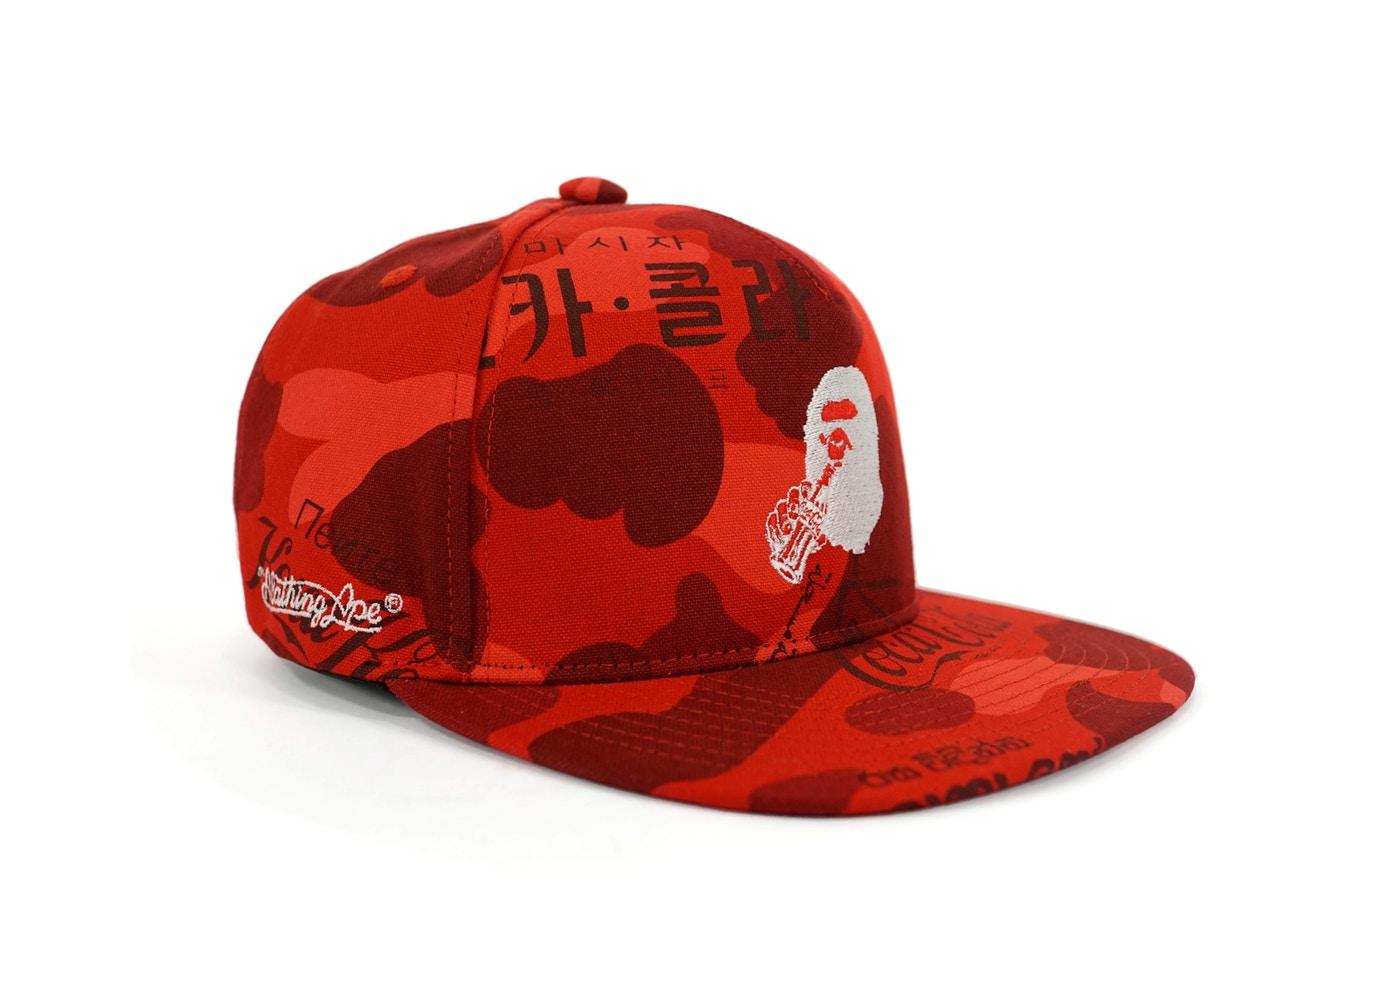 33ca0b4053c Bape Coca Cola Camo Snapback Hat Red Bathing Ape